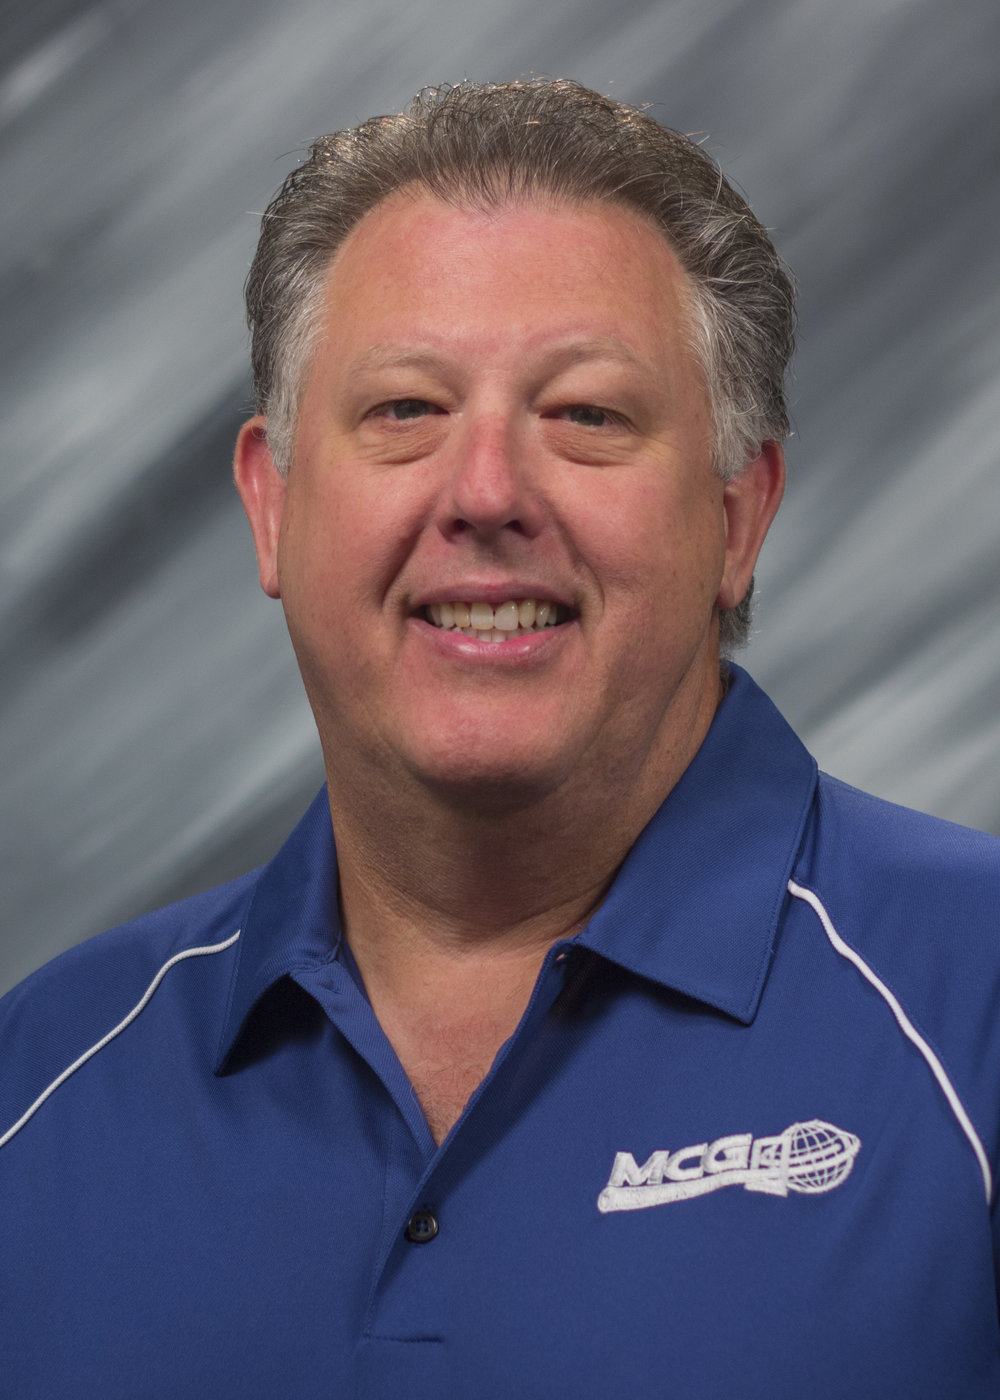 Mark Falck, Operations/Admin Manager